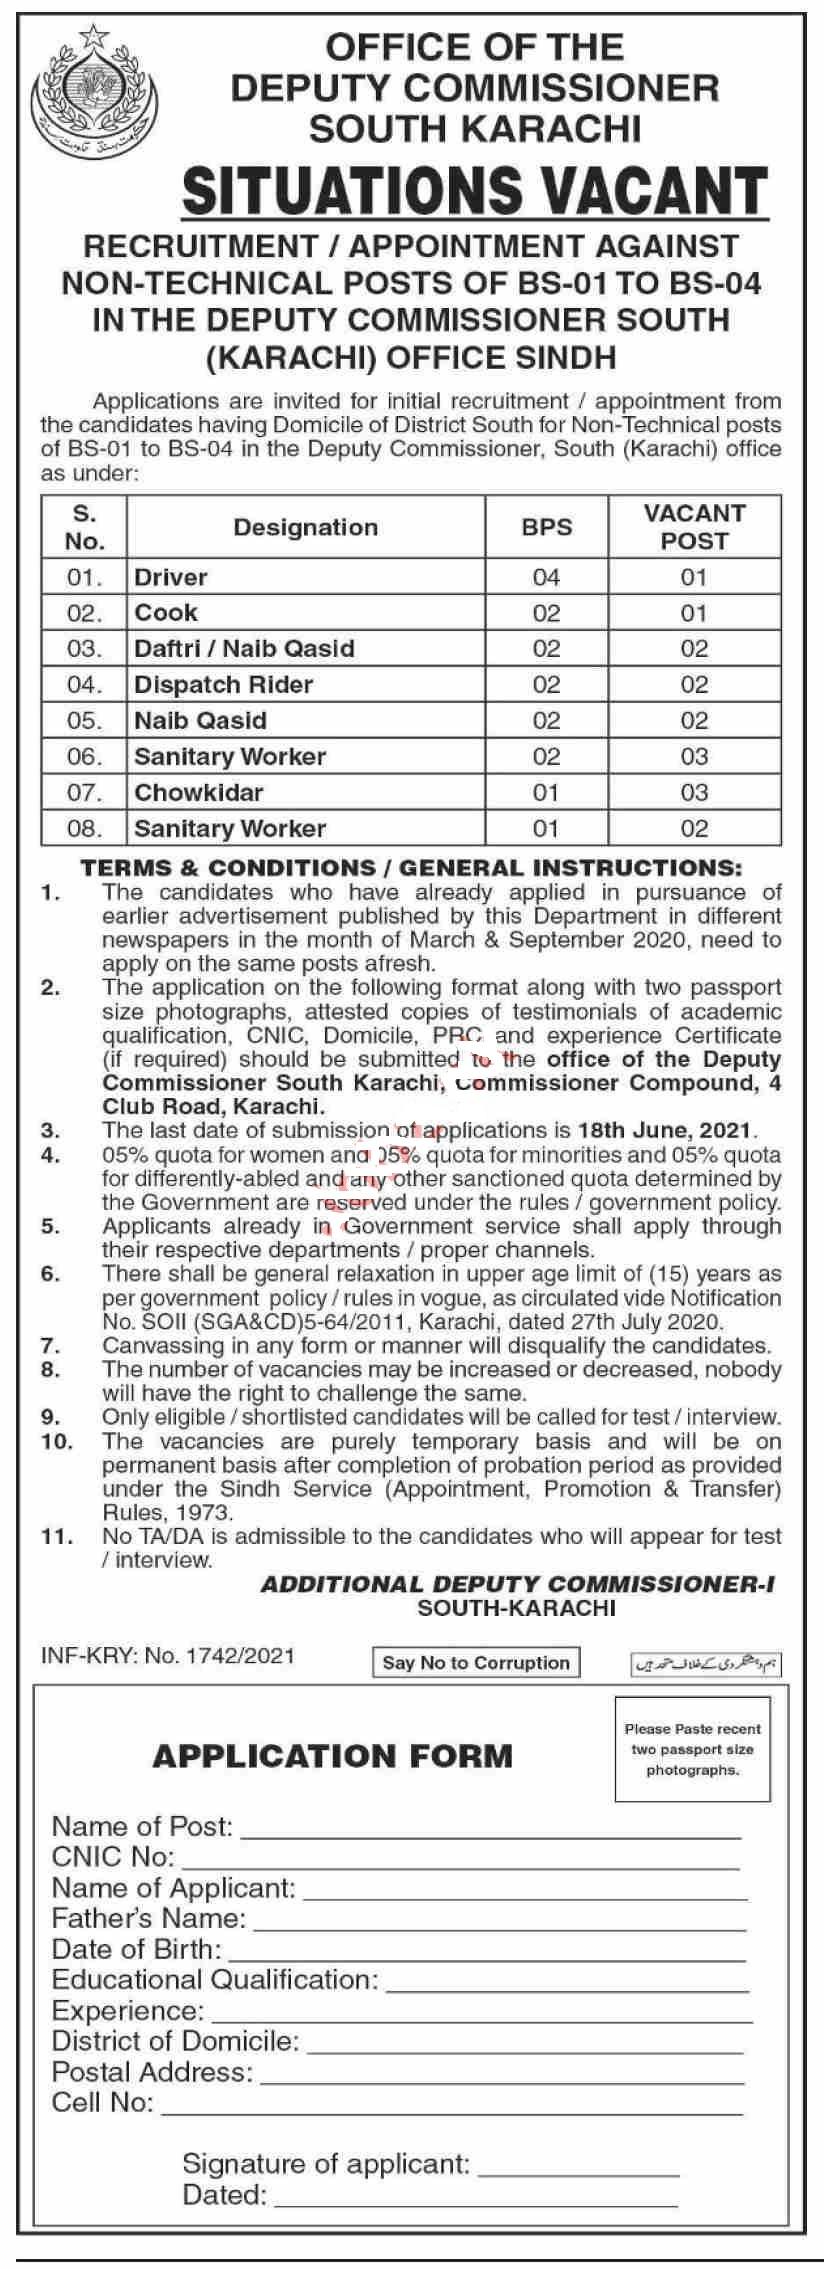 Deputy Commissioner DC South Karachi Jobs 2021 for Driver, Cook, Daftri, Naib Qasid, Dispatch Rider, Sanitary Worker